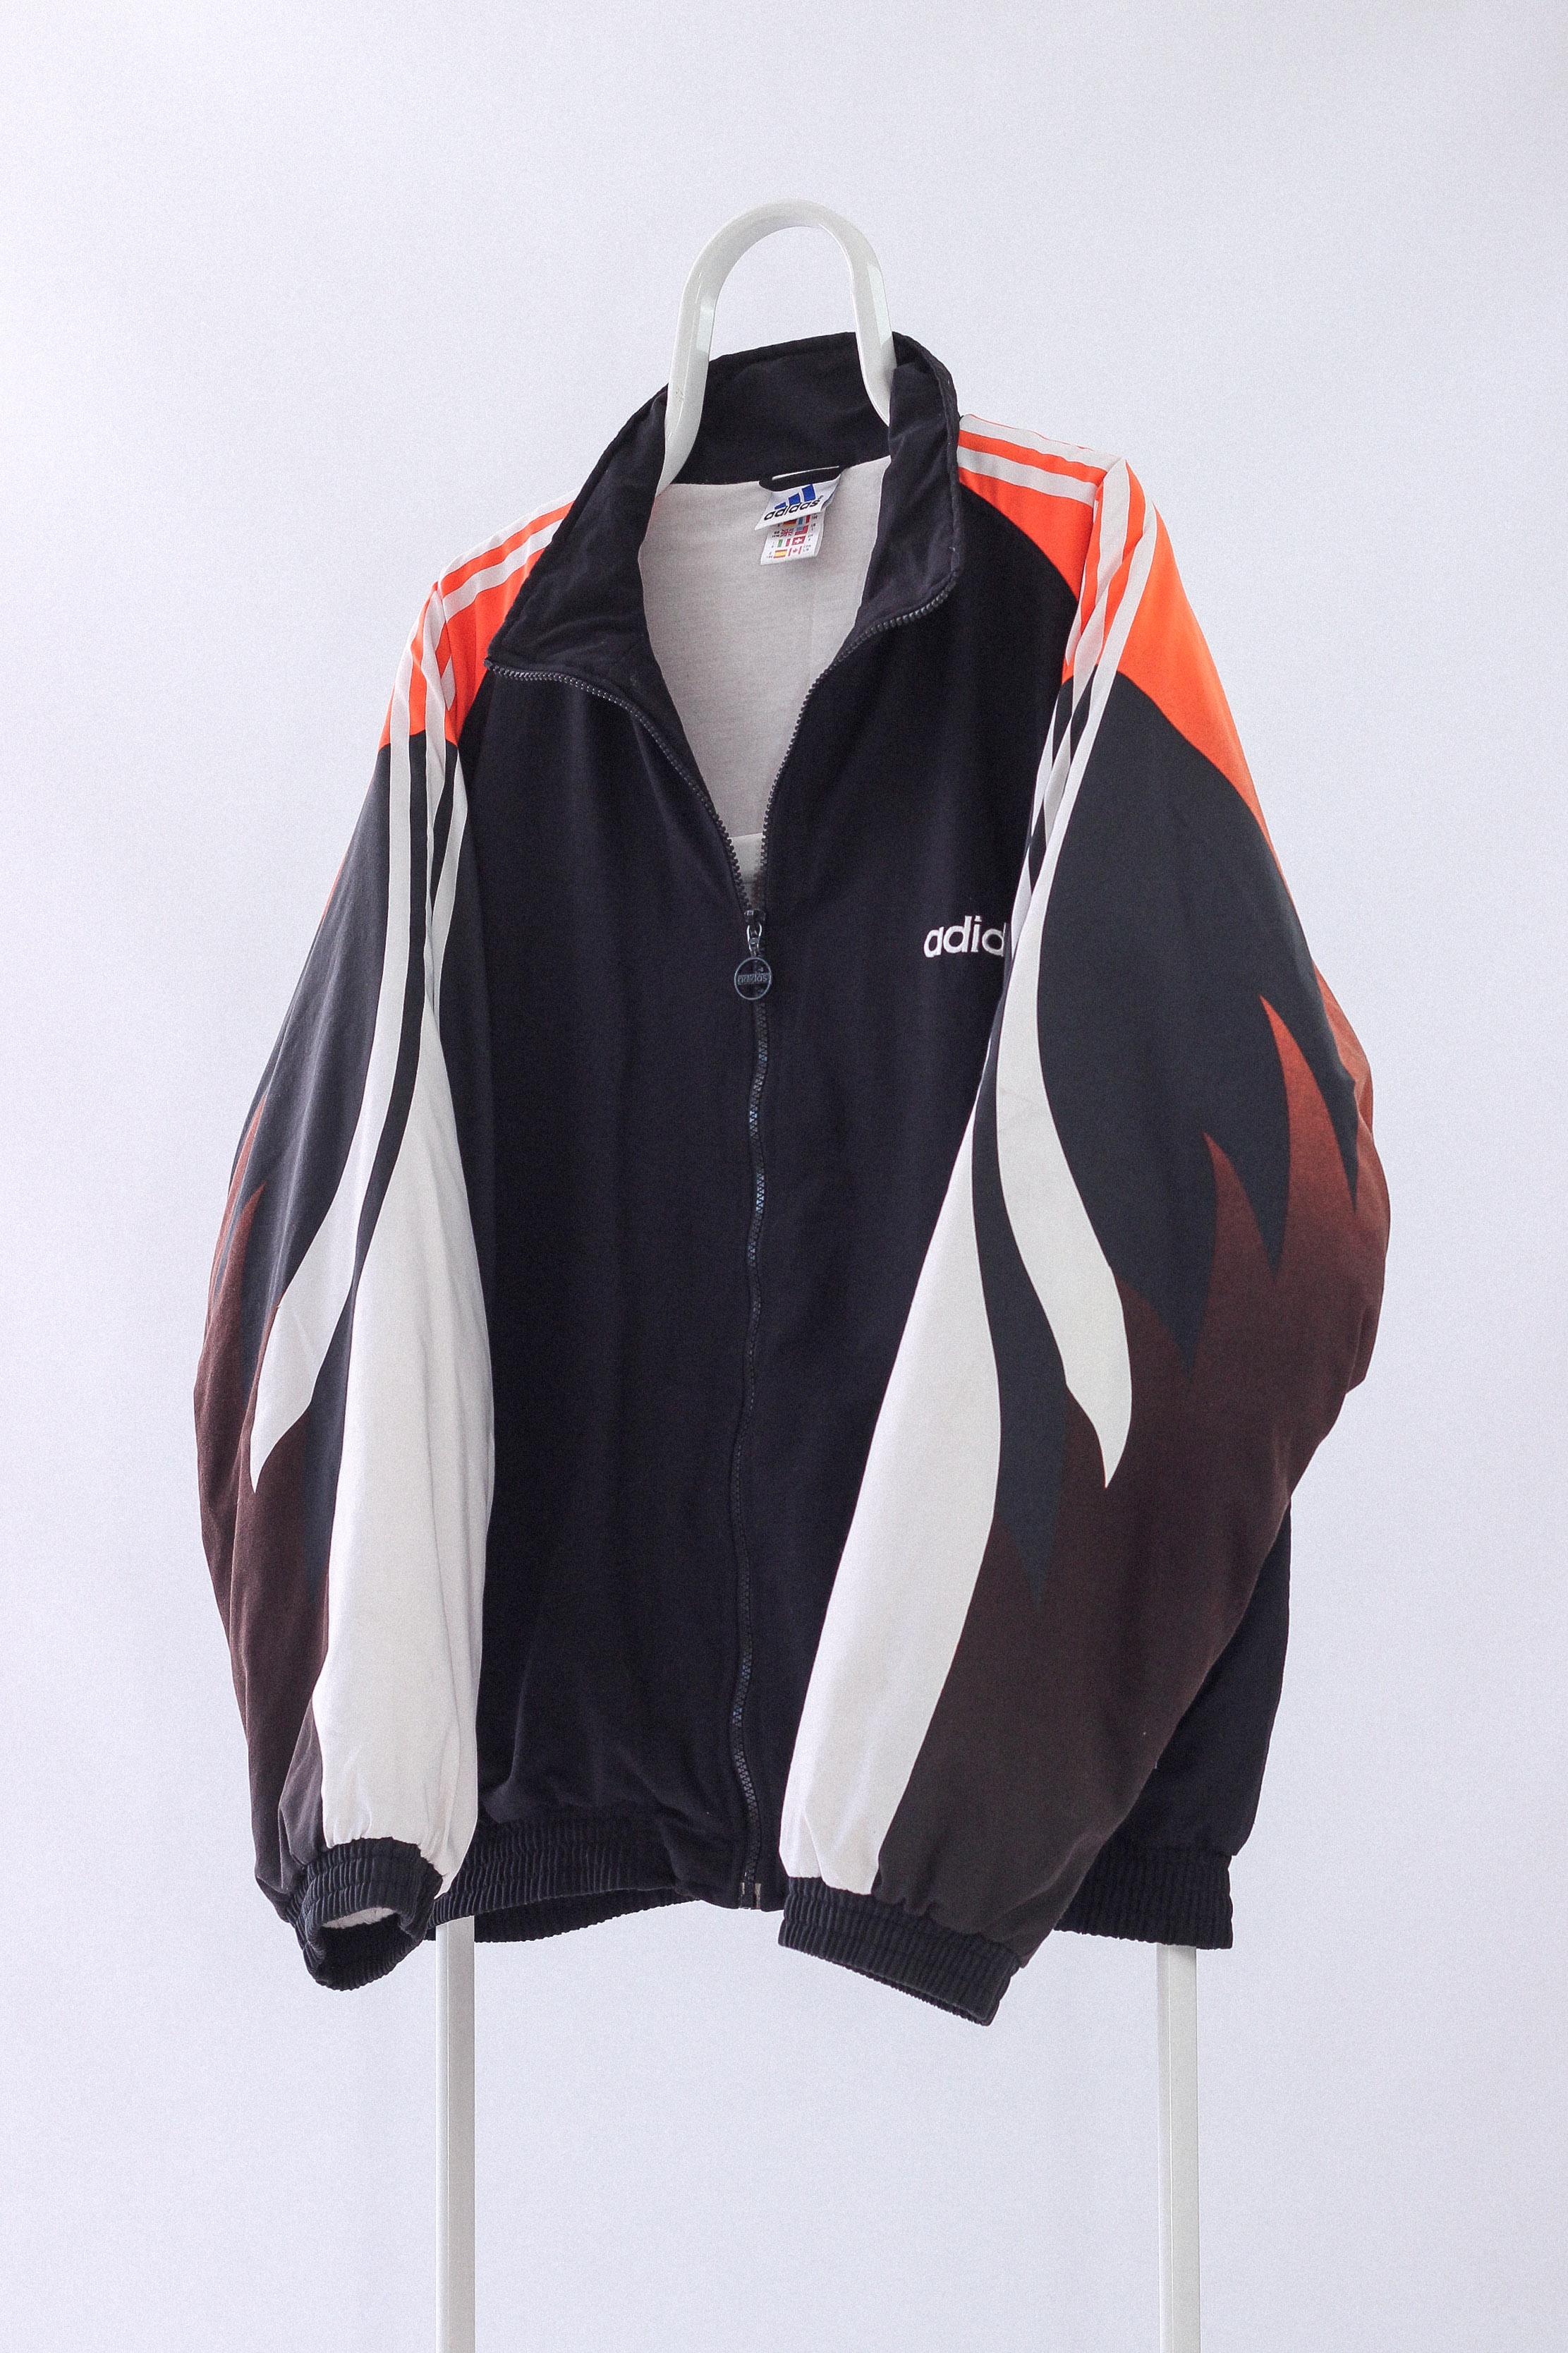 69d7048b305 Adidas × Vintage. Vintage Mens ADIDAS Team Soccer Training Winter Jacket  FIRE